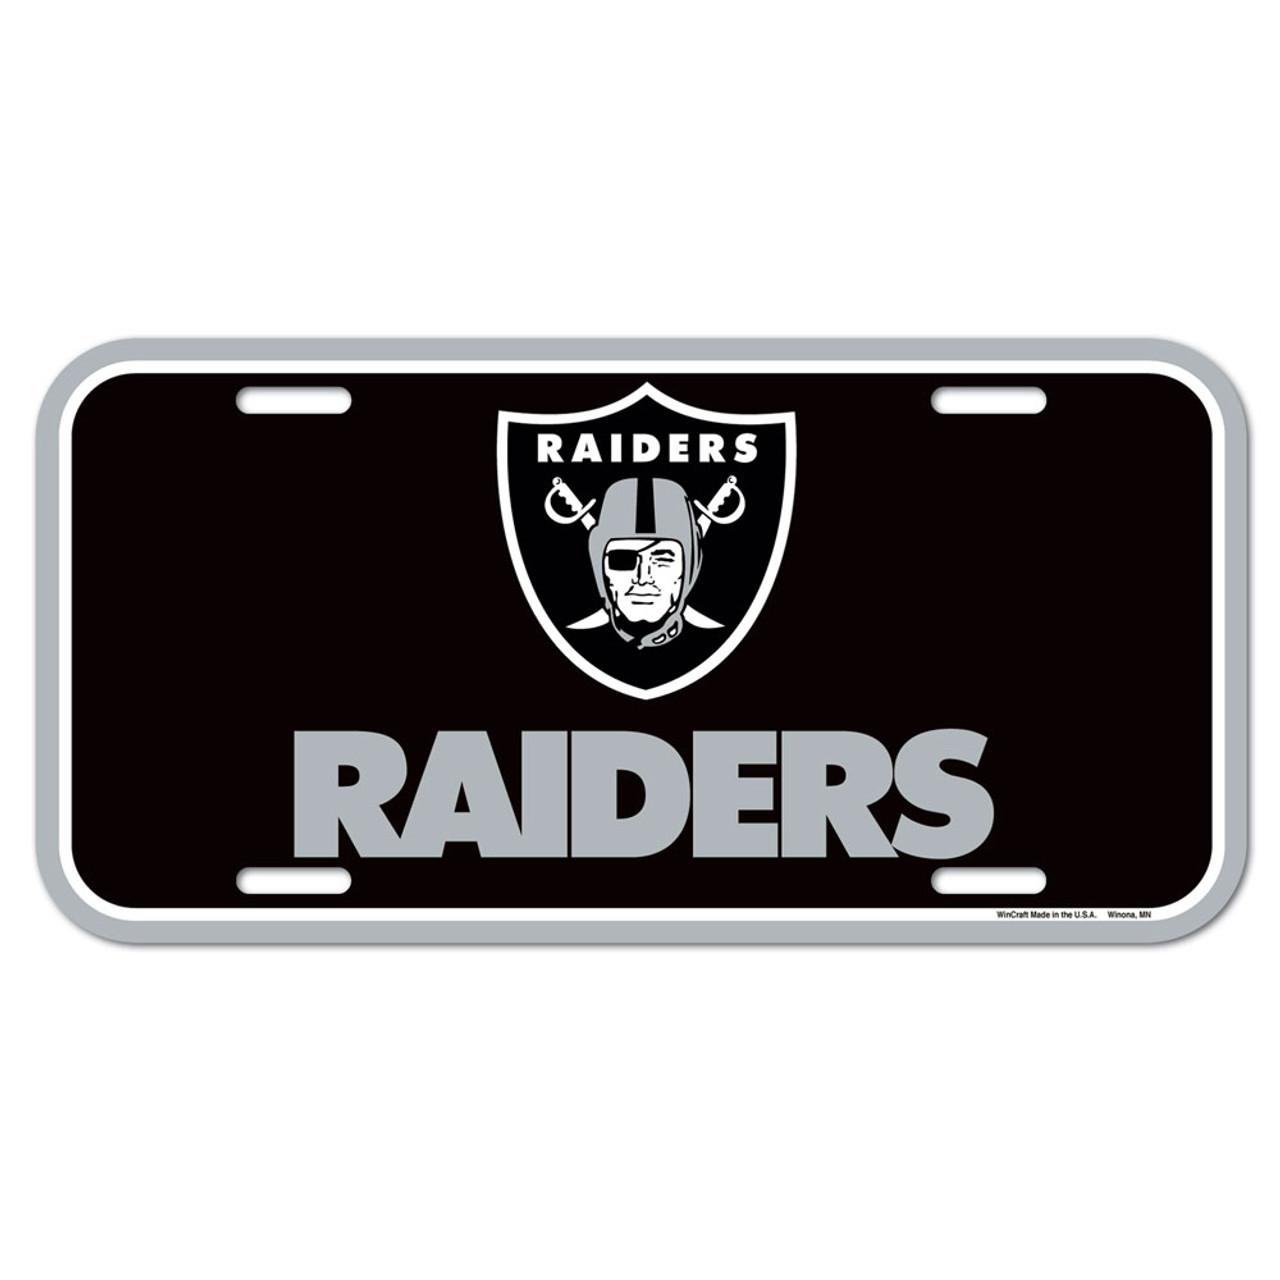 Las Vegas Raiders EZ View All Over Chrome Frame Metal License Plate Tag Cover